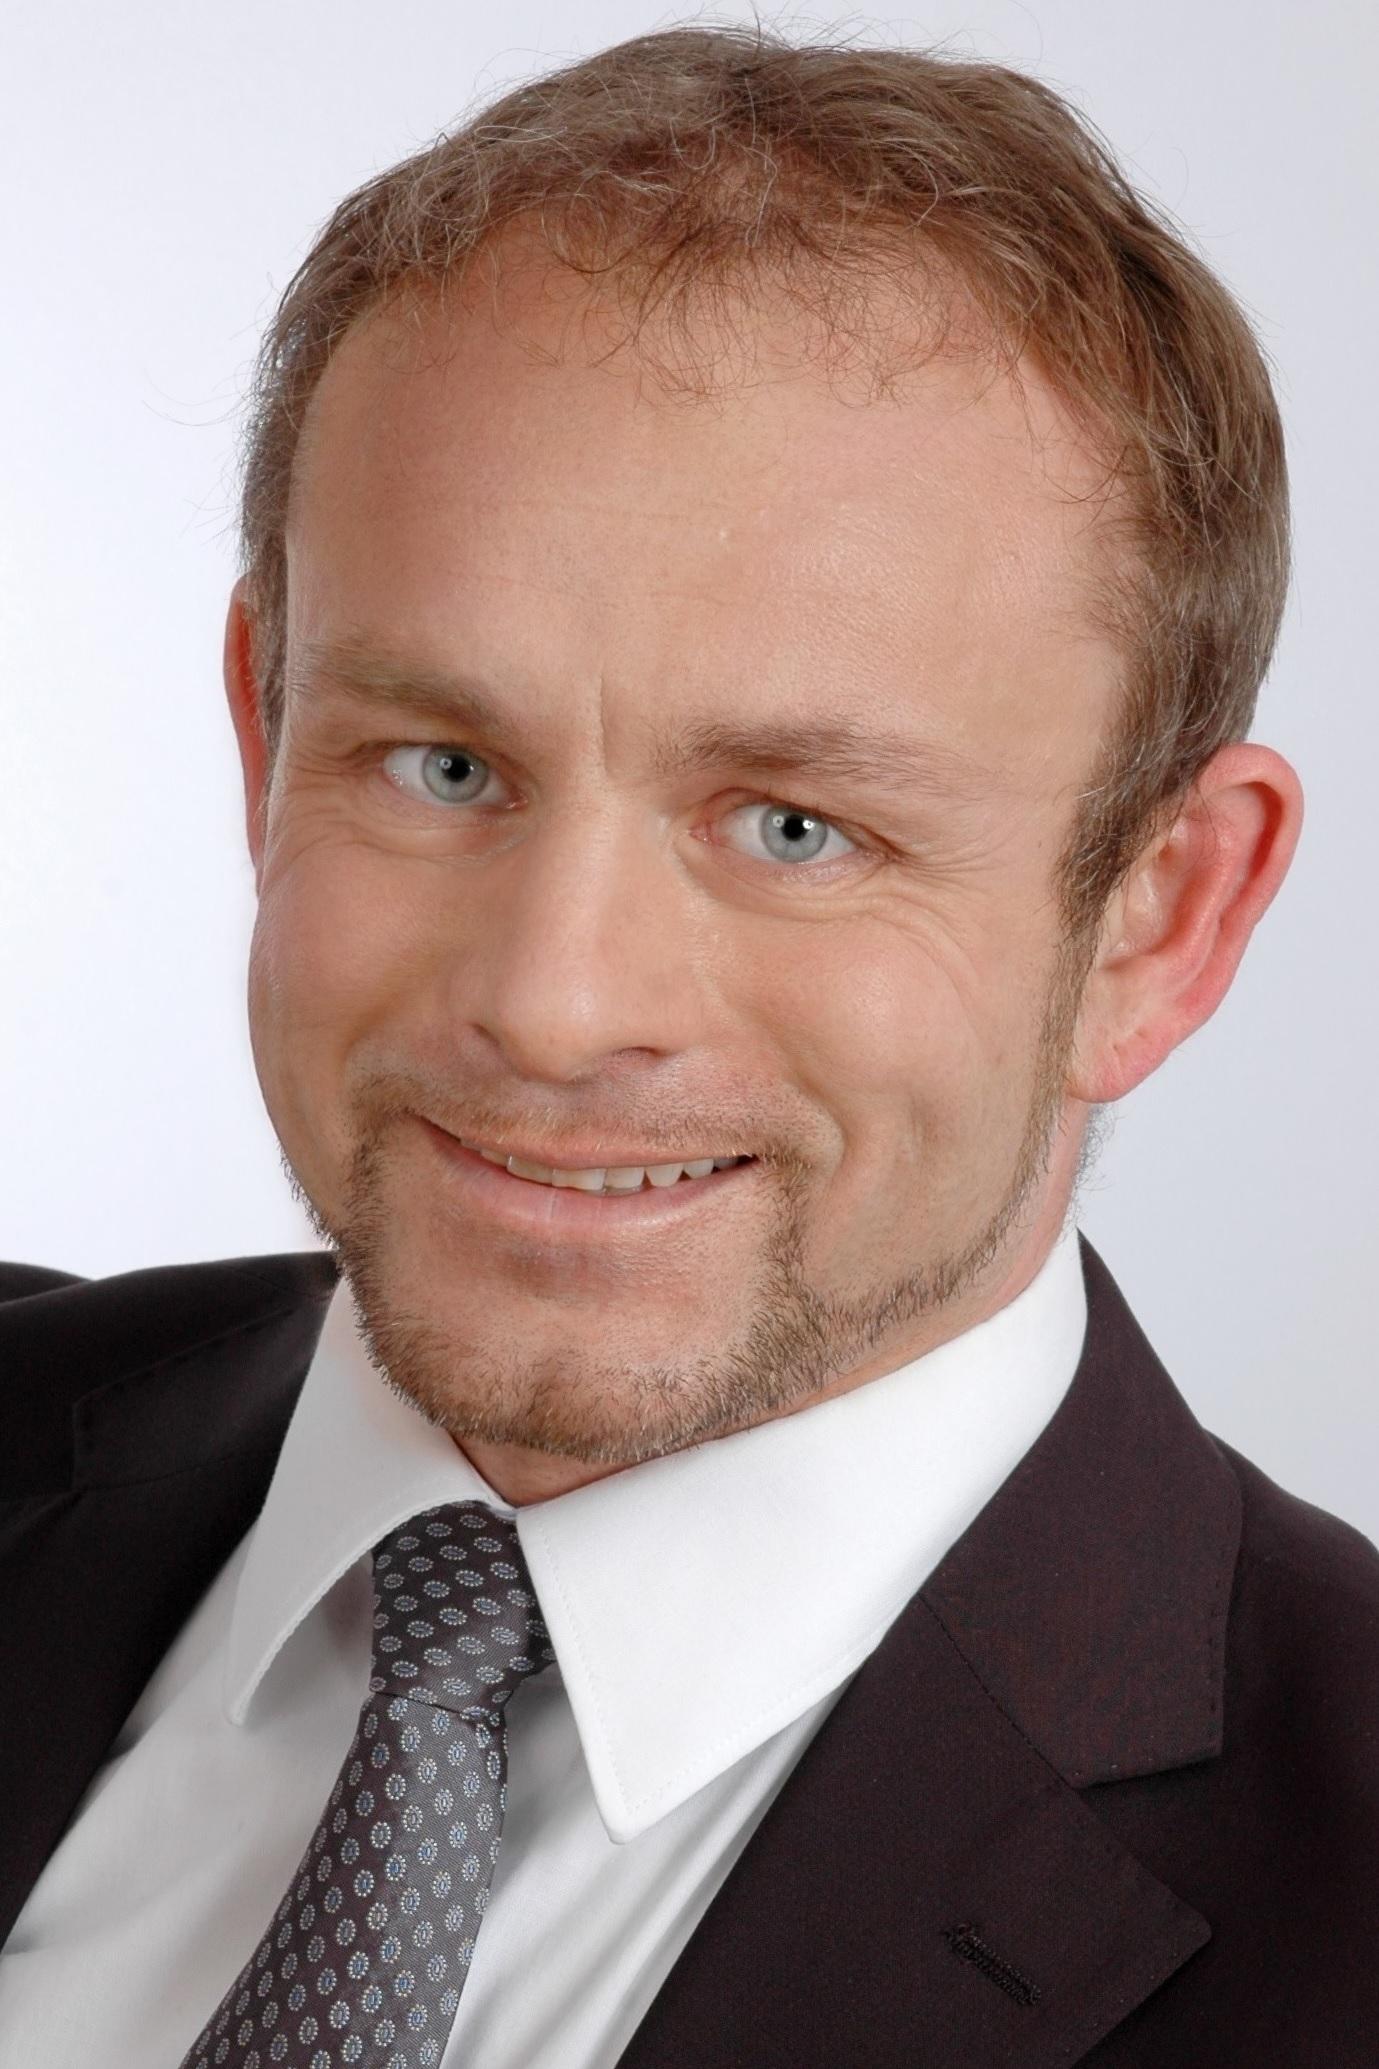 Johannes Hausmann